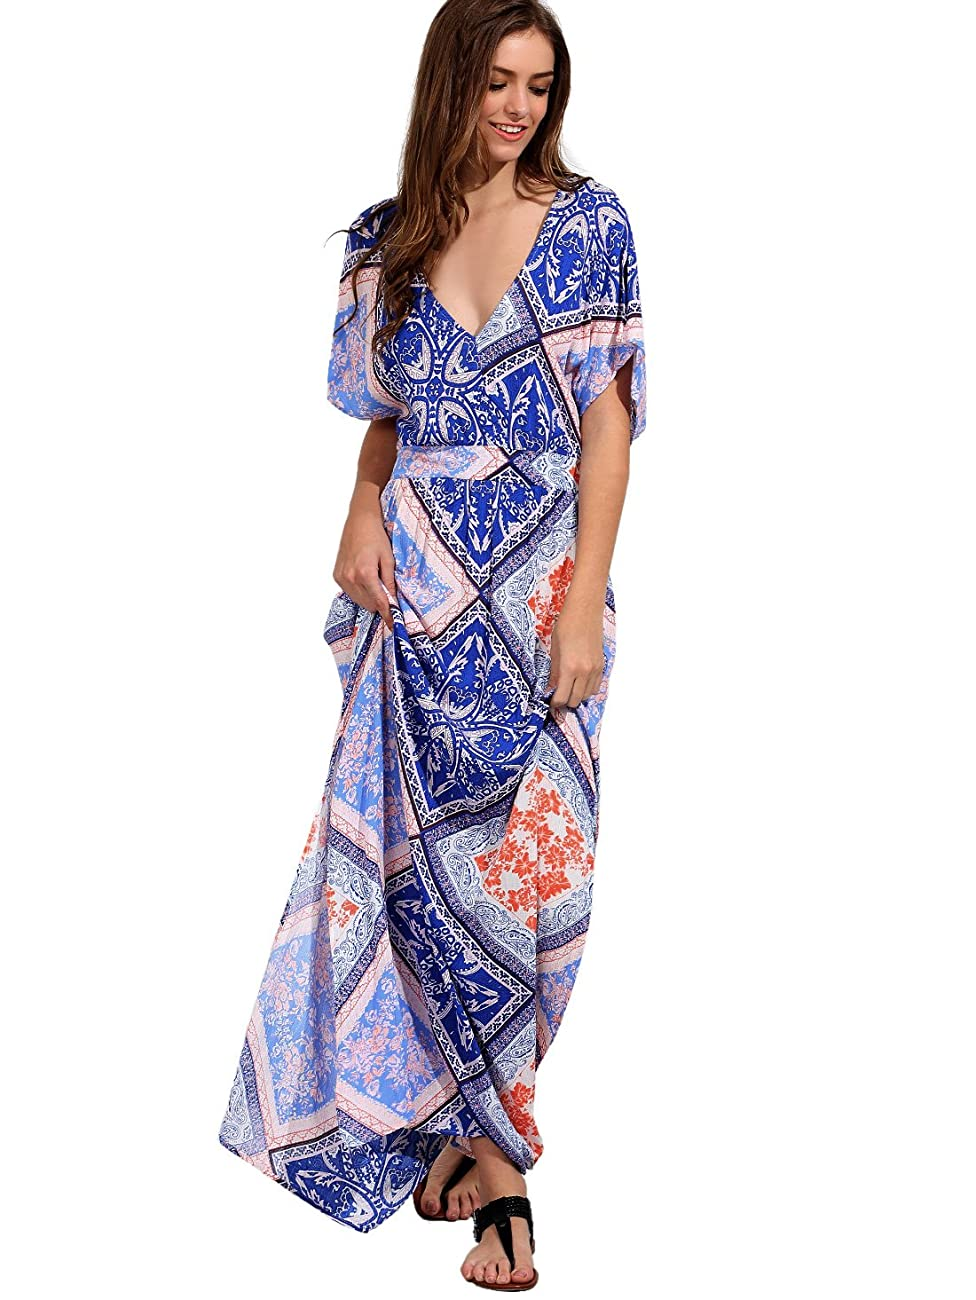 Milumia Women's Boho Split Tie-Waist Vintage Print Maxi Dress 3